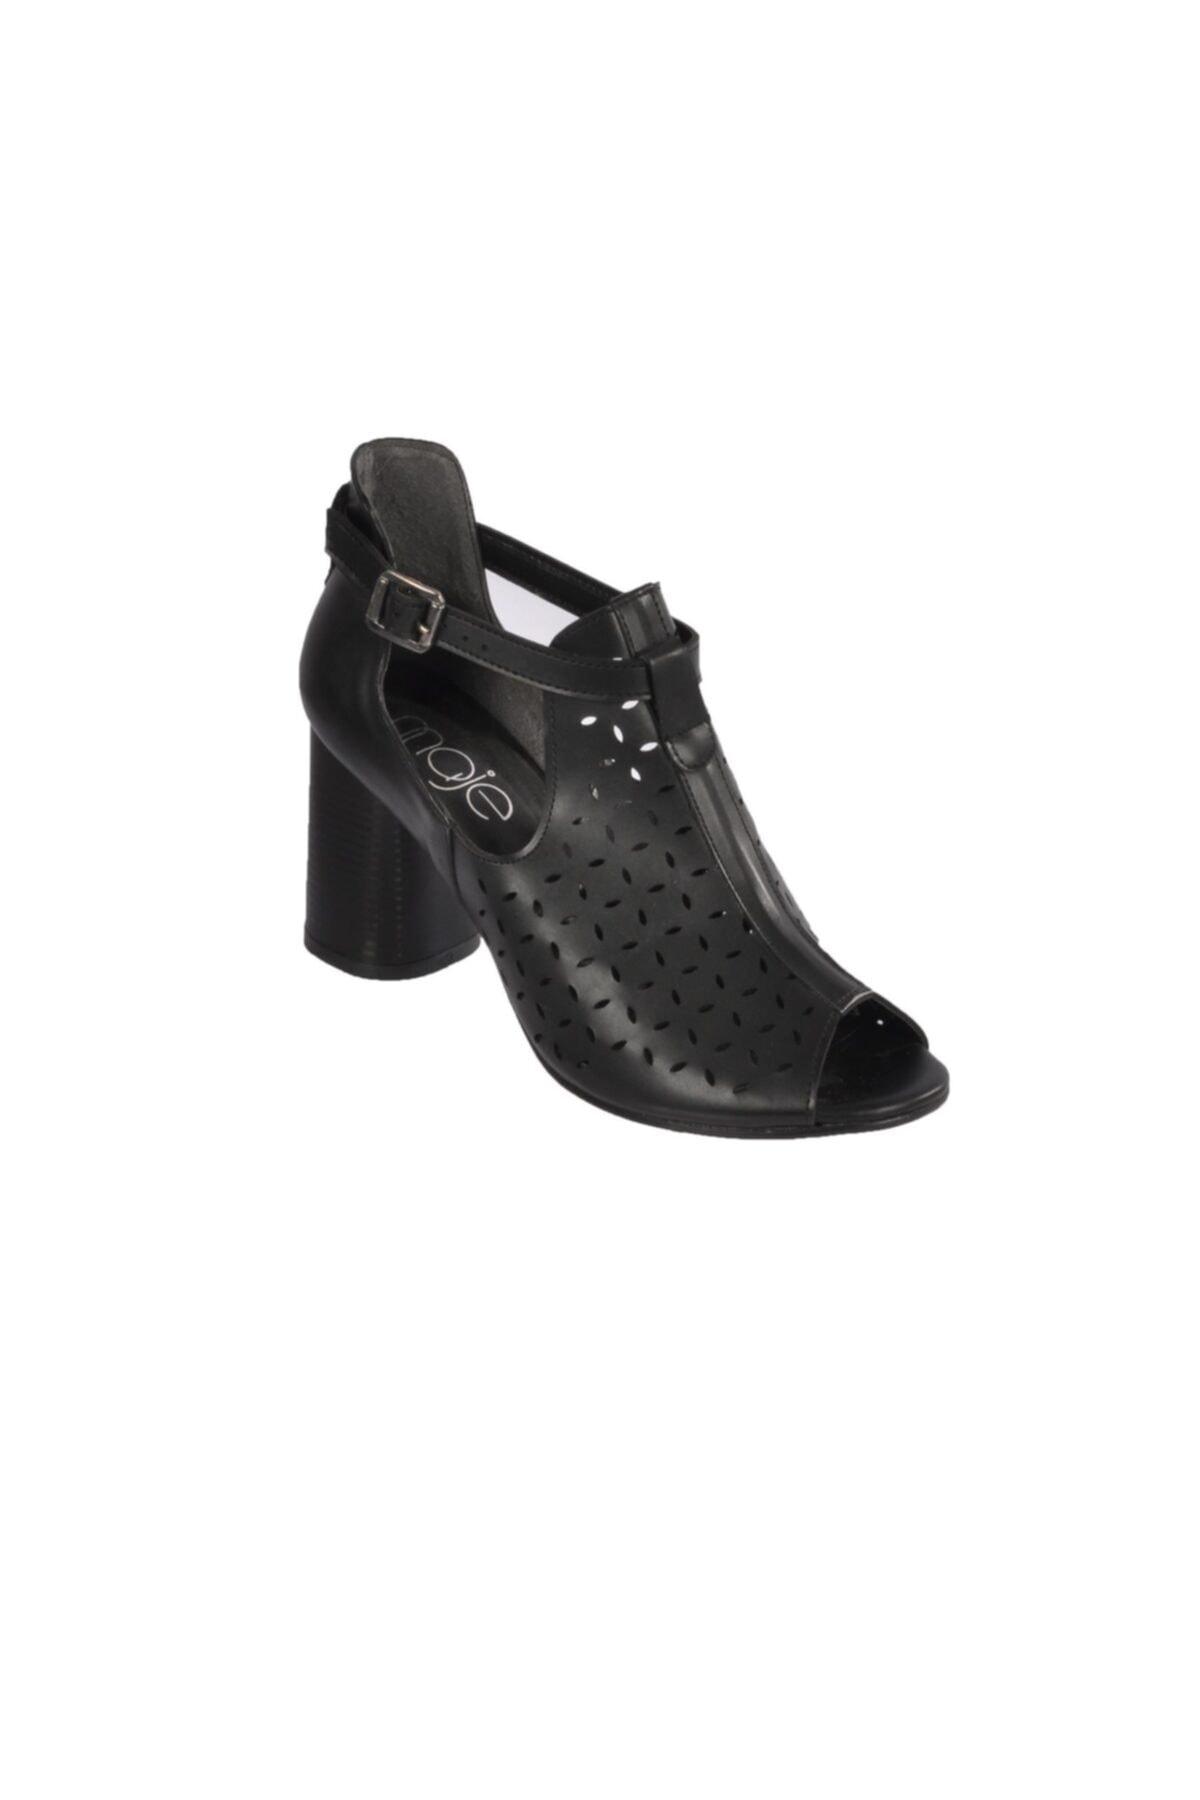 Maje Kadın  Siyah Topuklu Ayakkabı 1